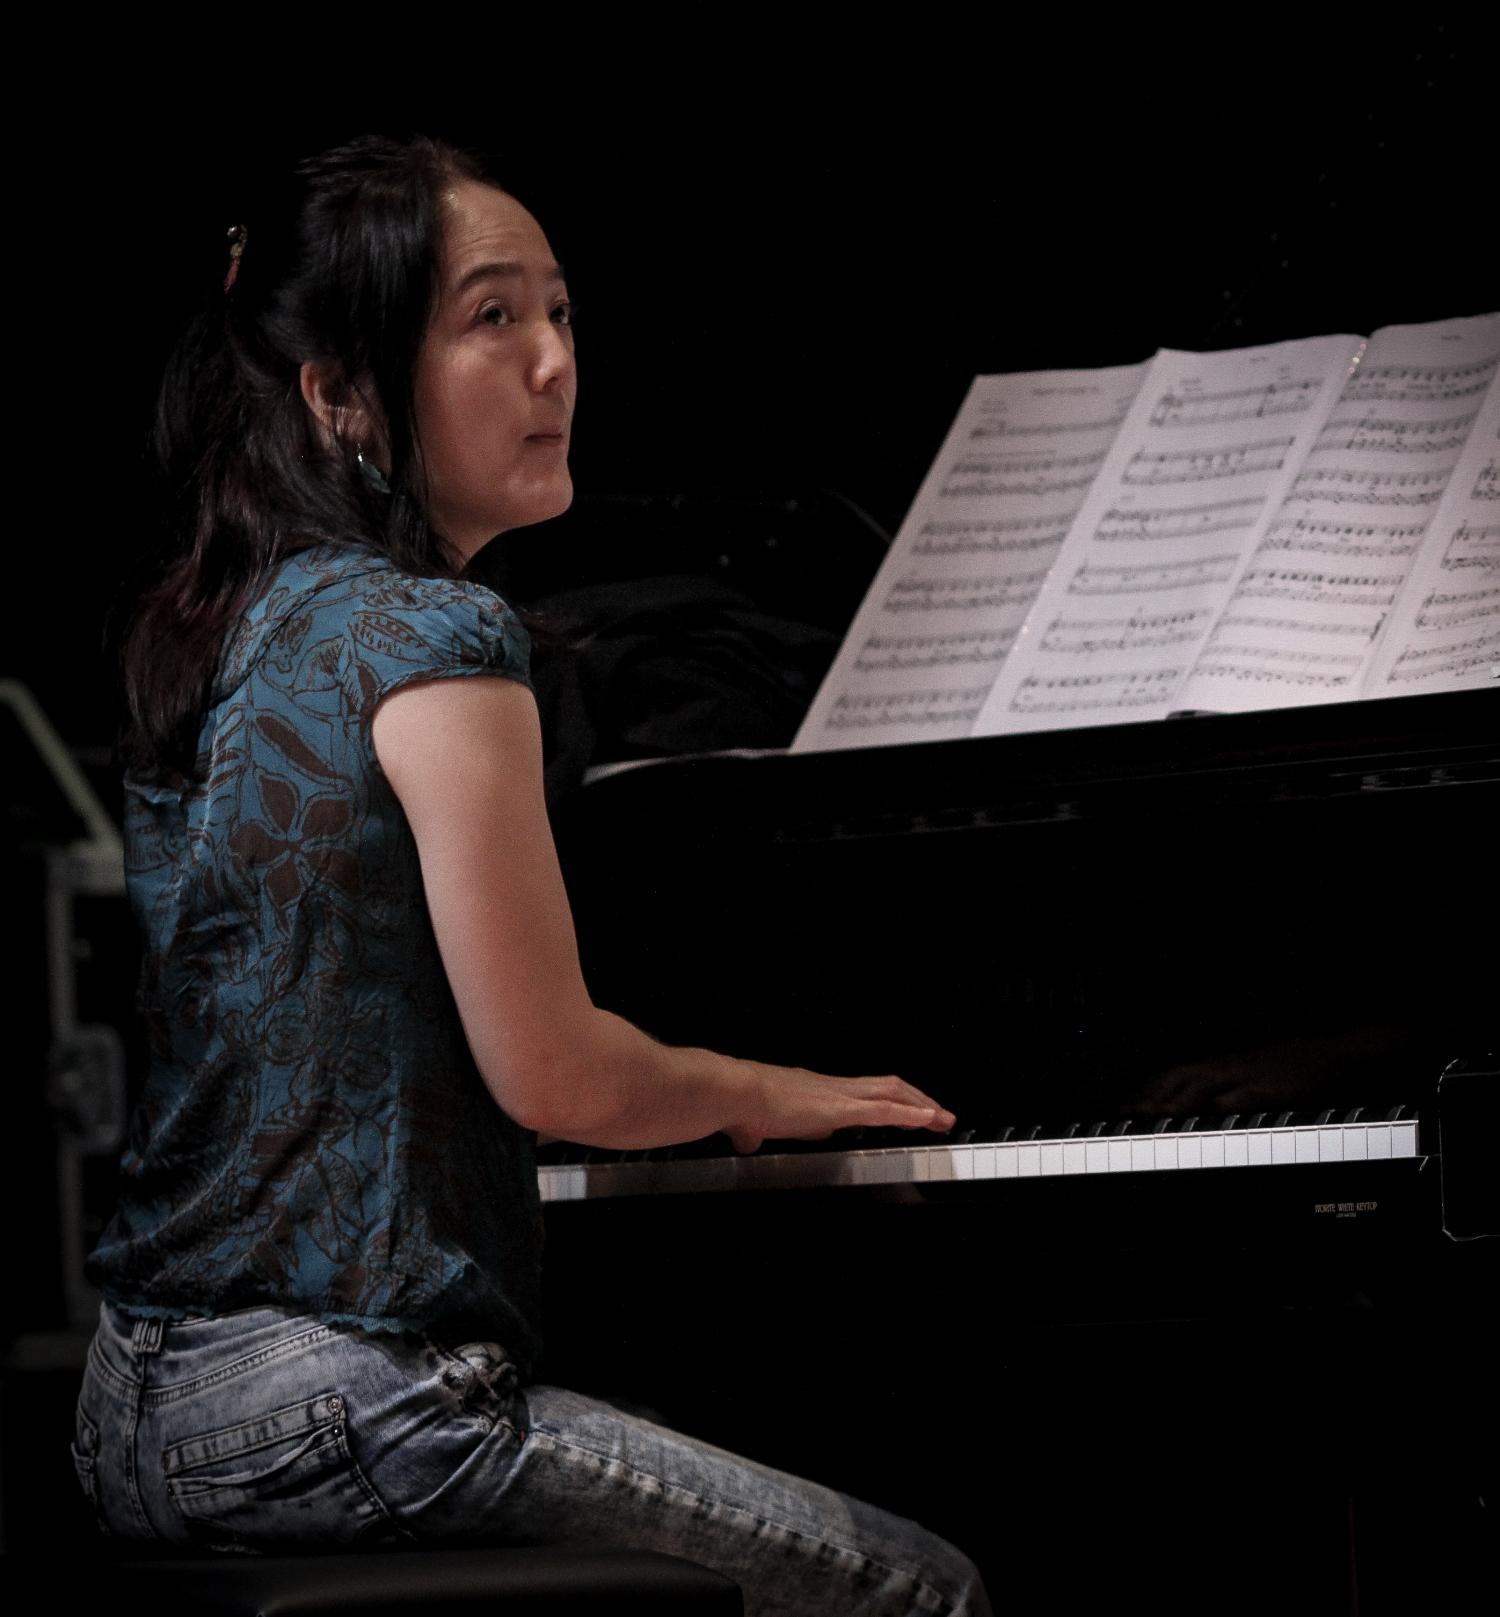 Makiko hirabayashi, valby summer jazz 2013, copenhagen, denmark